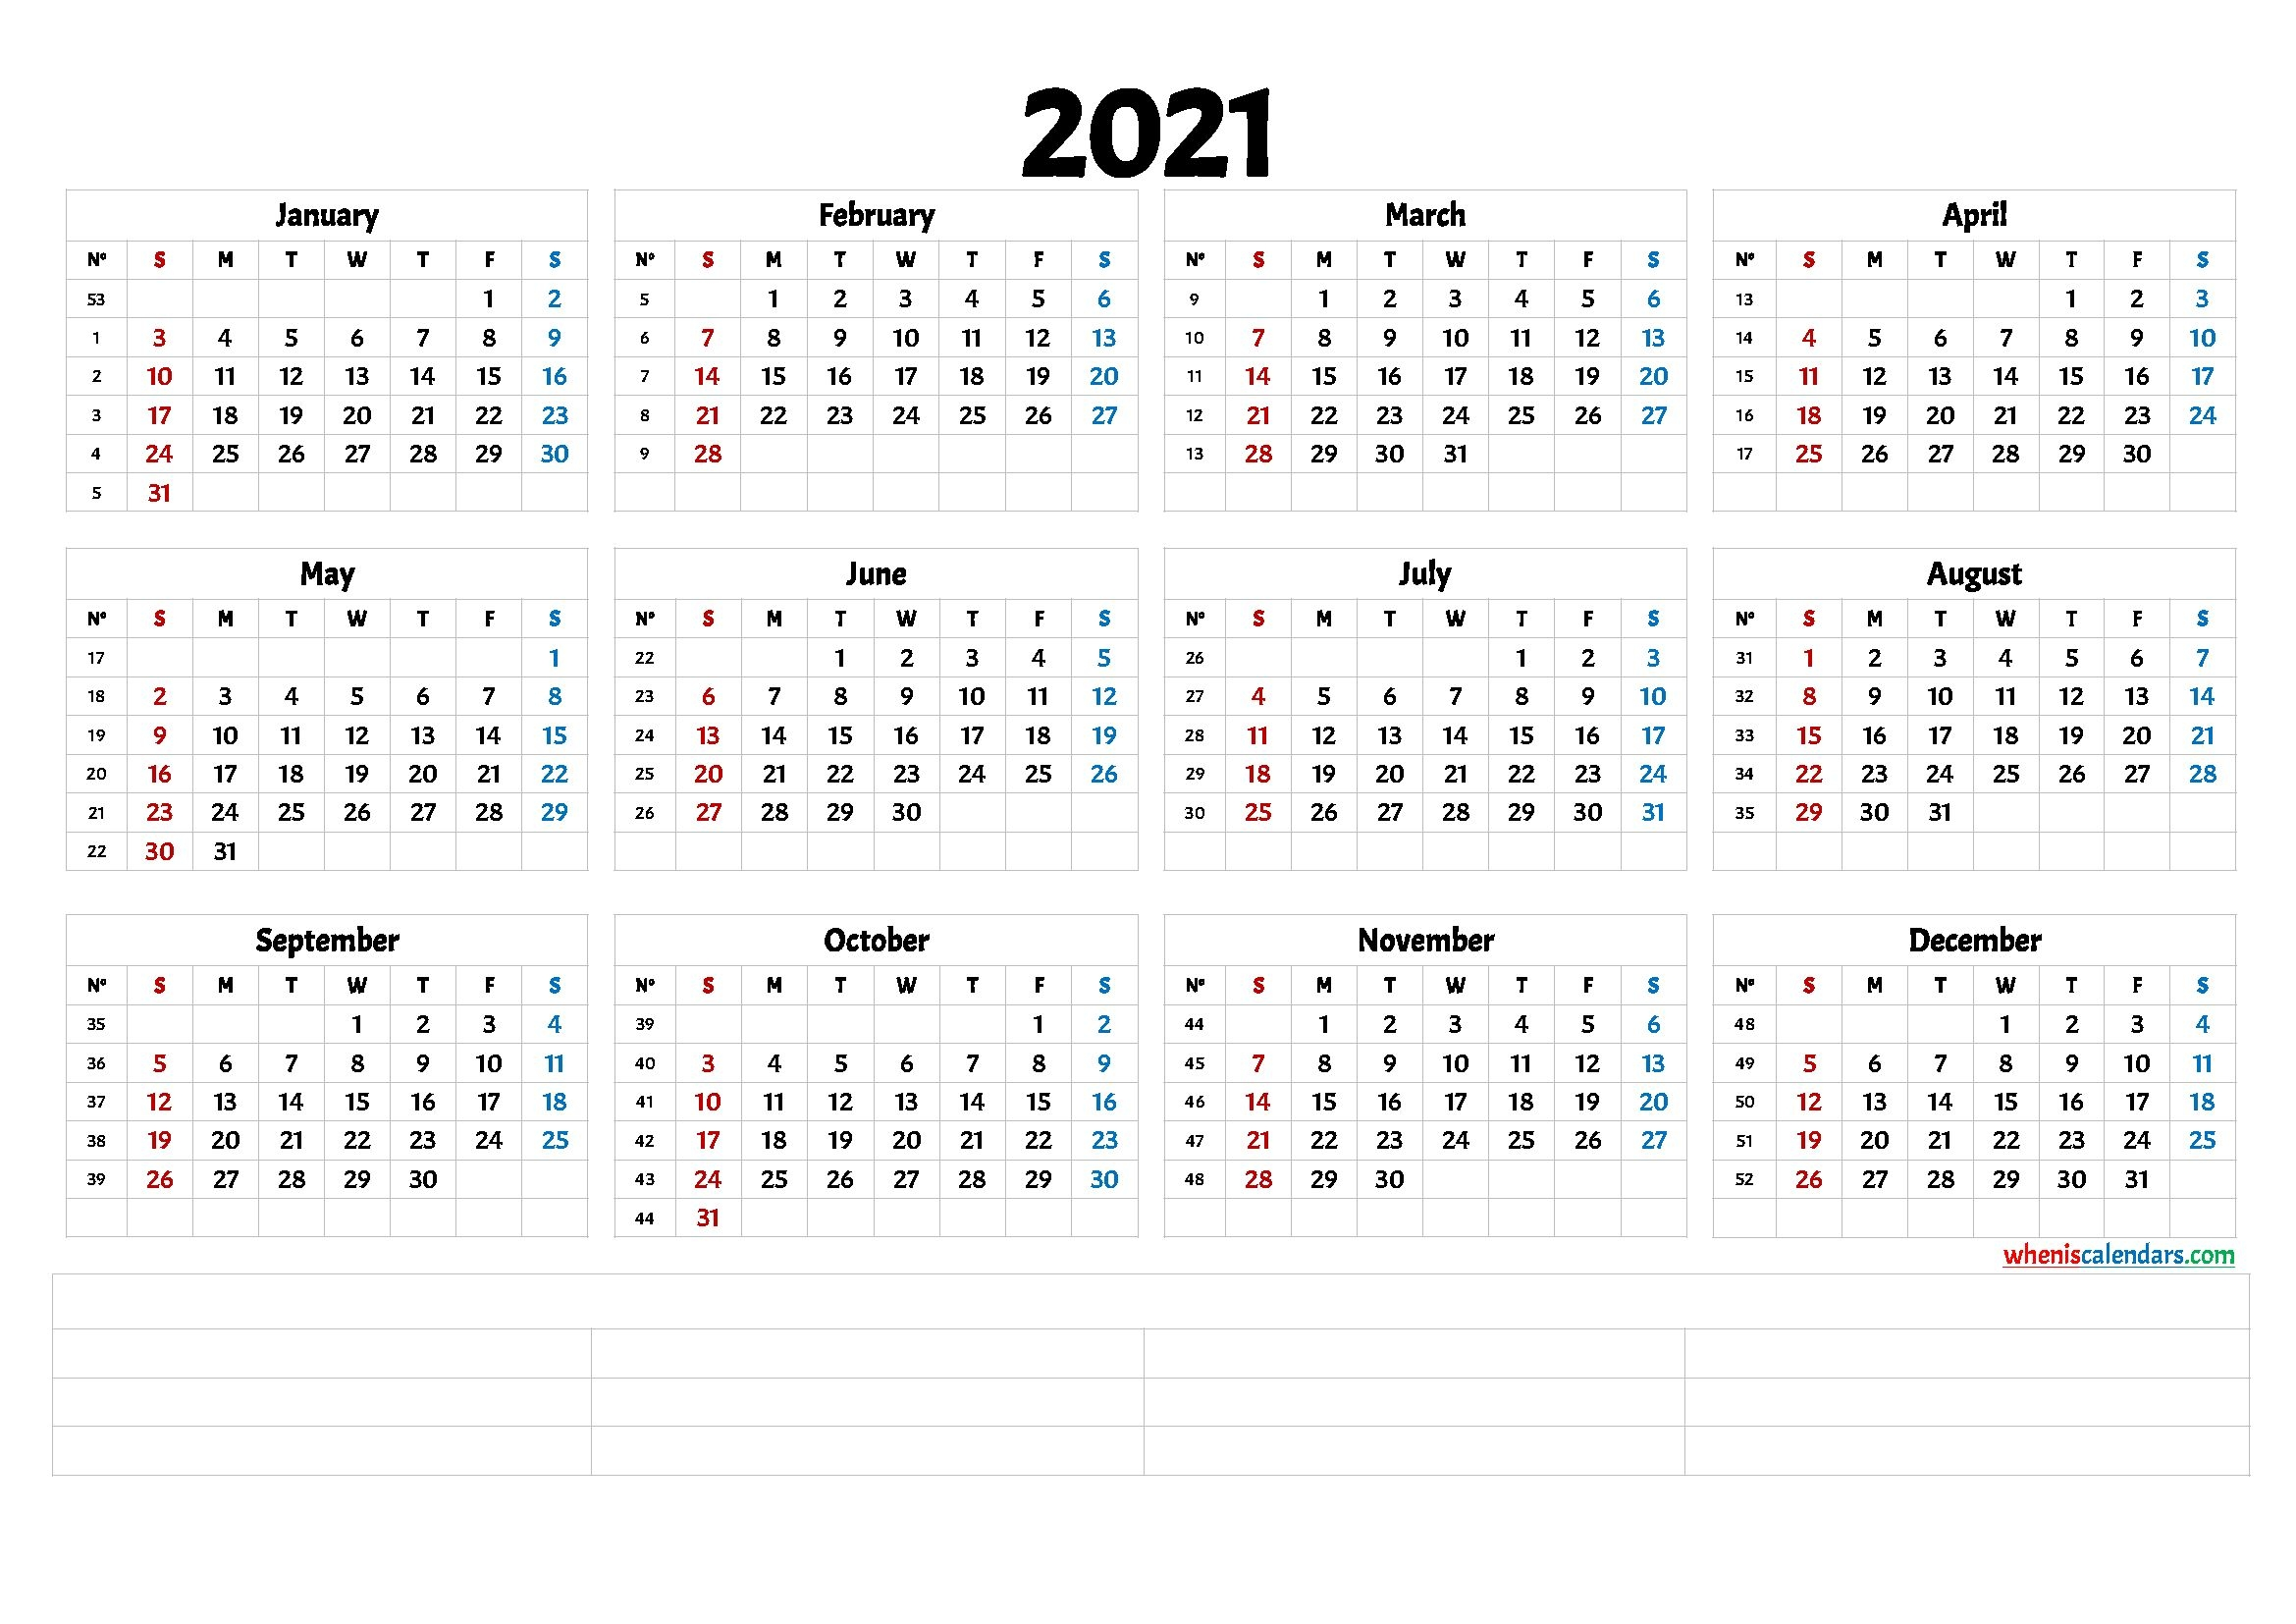 2021 free printable yearly calendar with week numbers (6